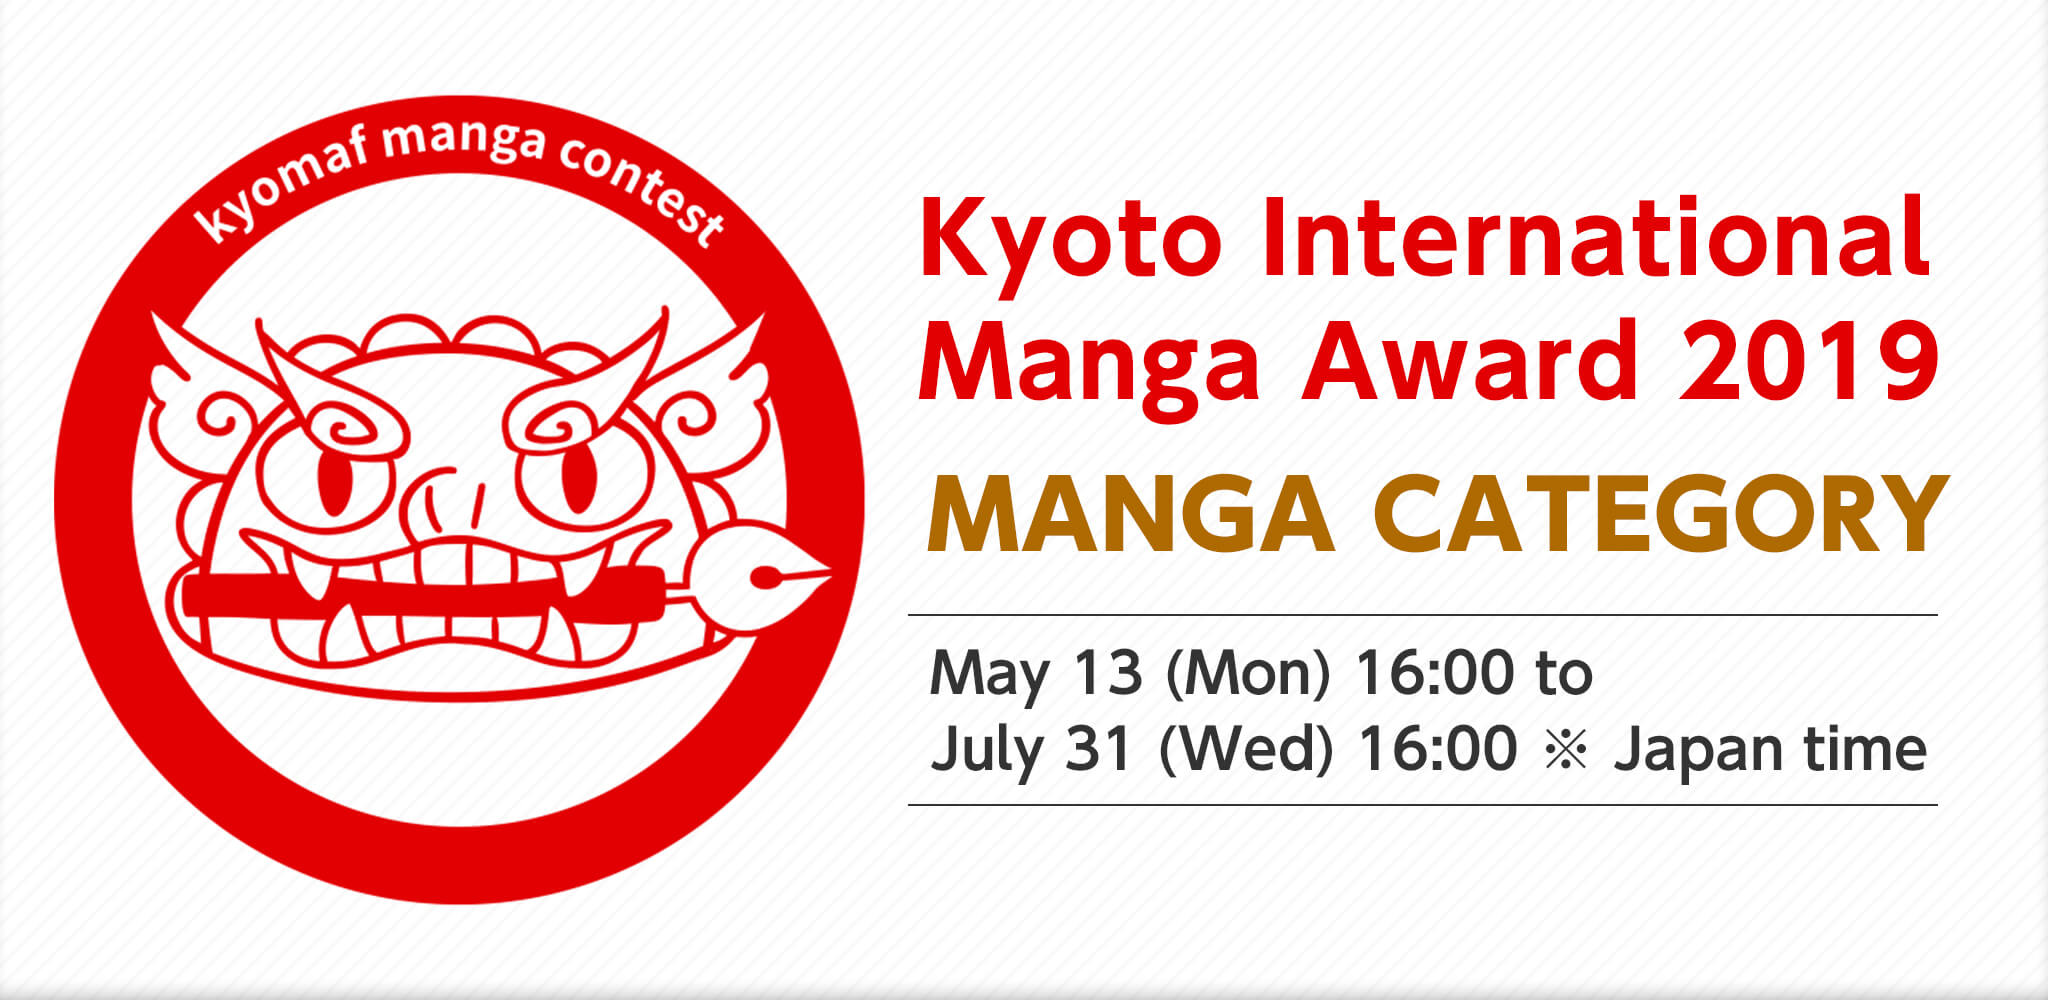 Kyoto International Manga Award 2019 | Contest  - ART street by MediBang